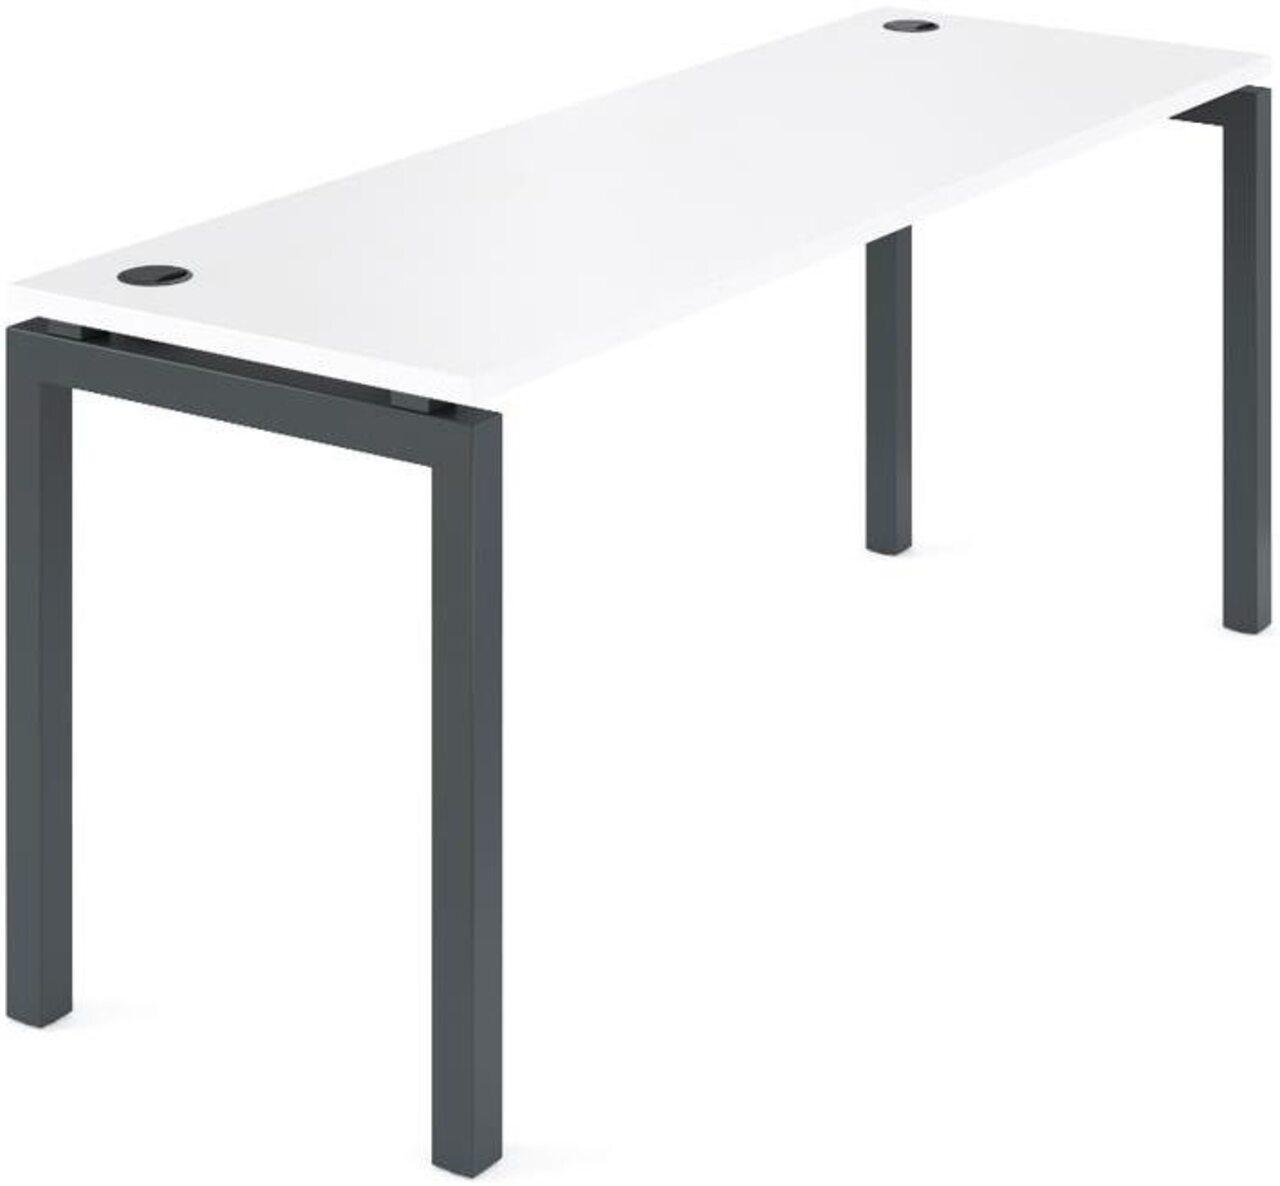 Стол на металлокаркасе  Арго 180x60x76 - фото 5